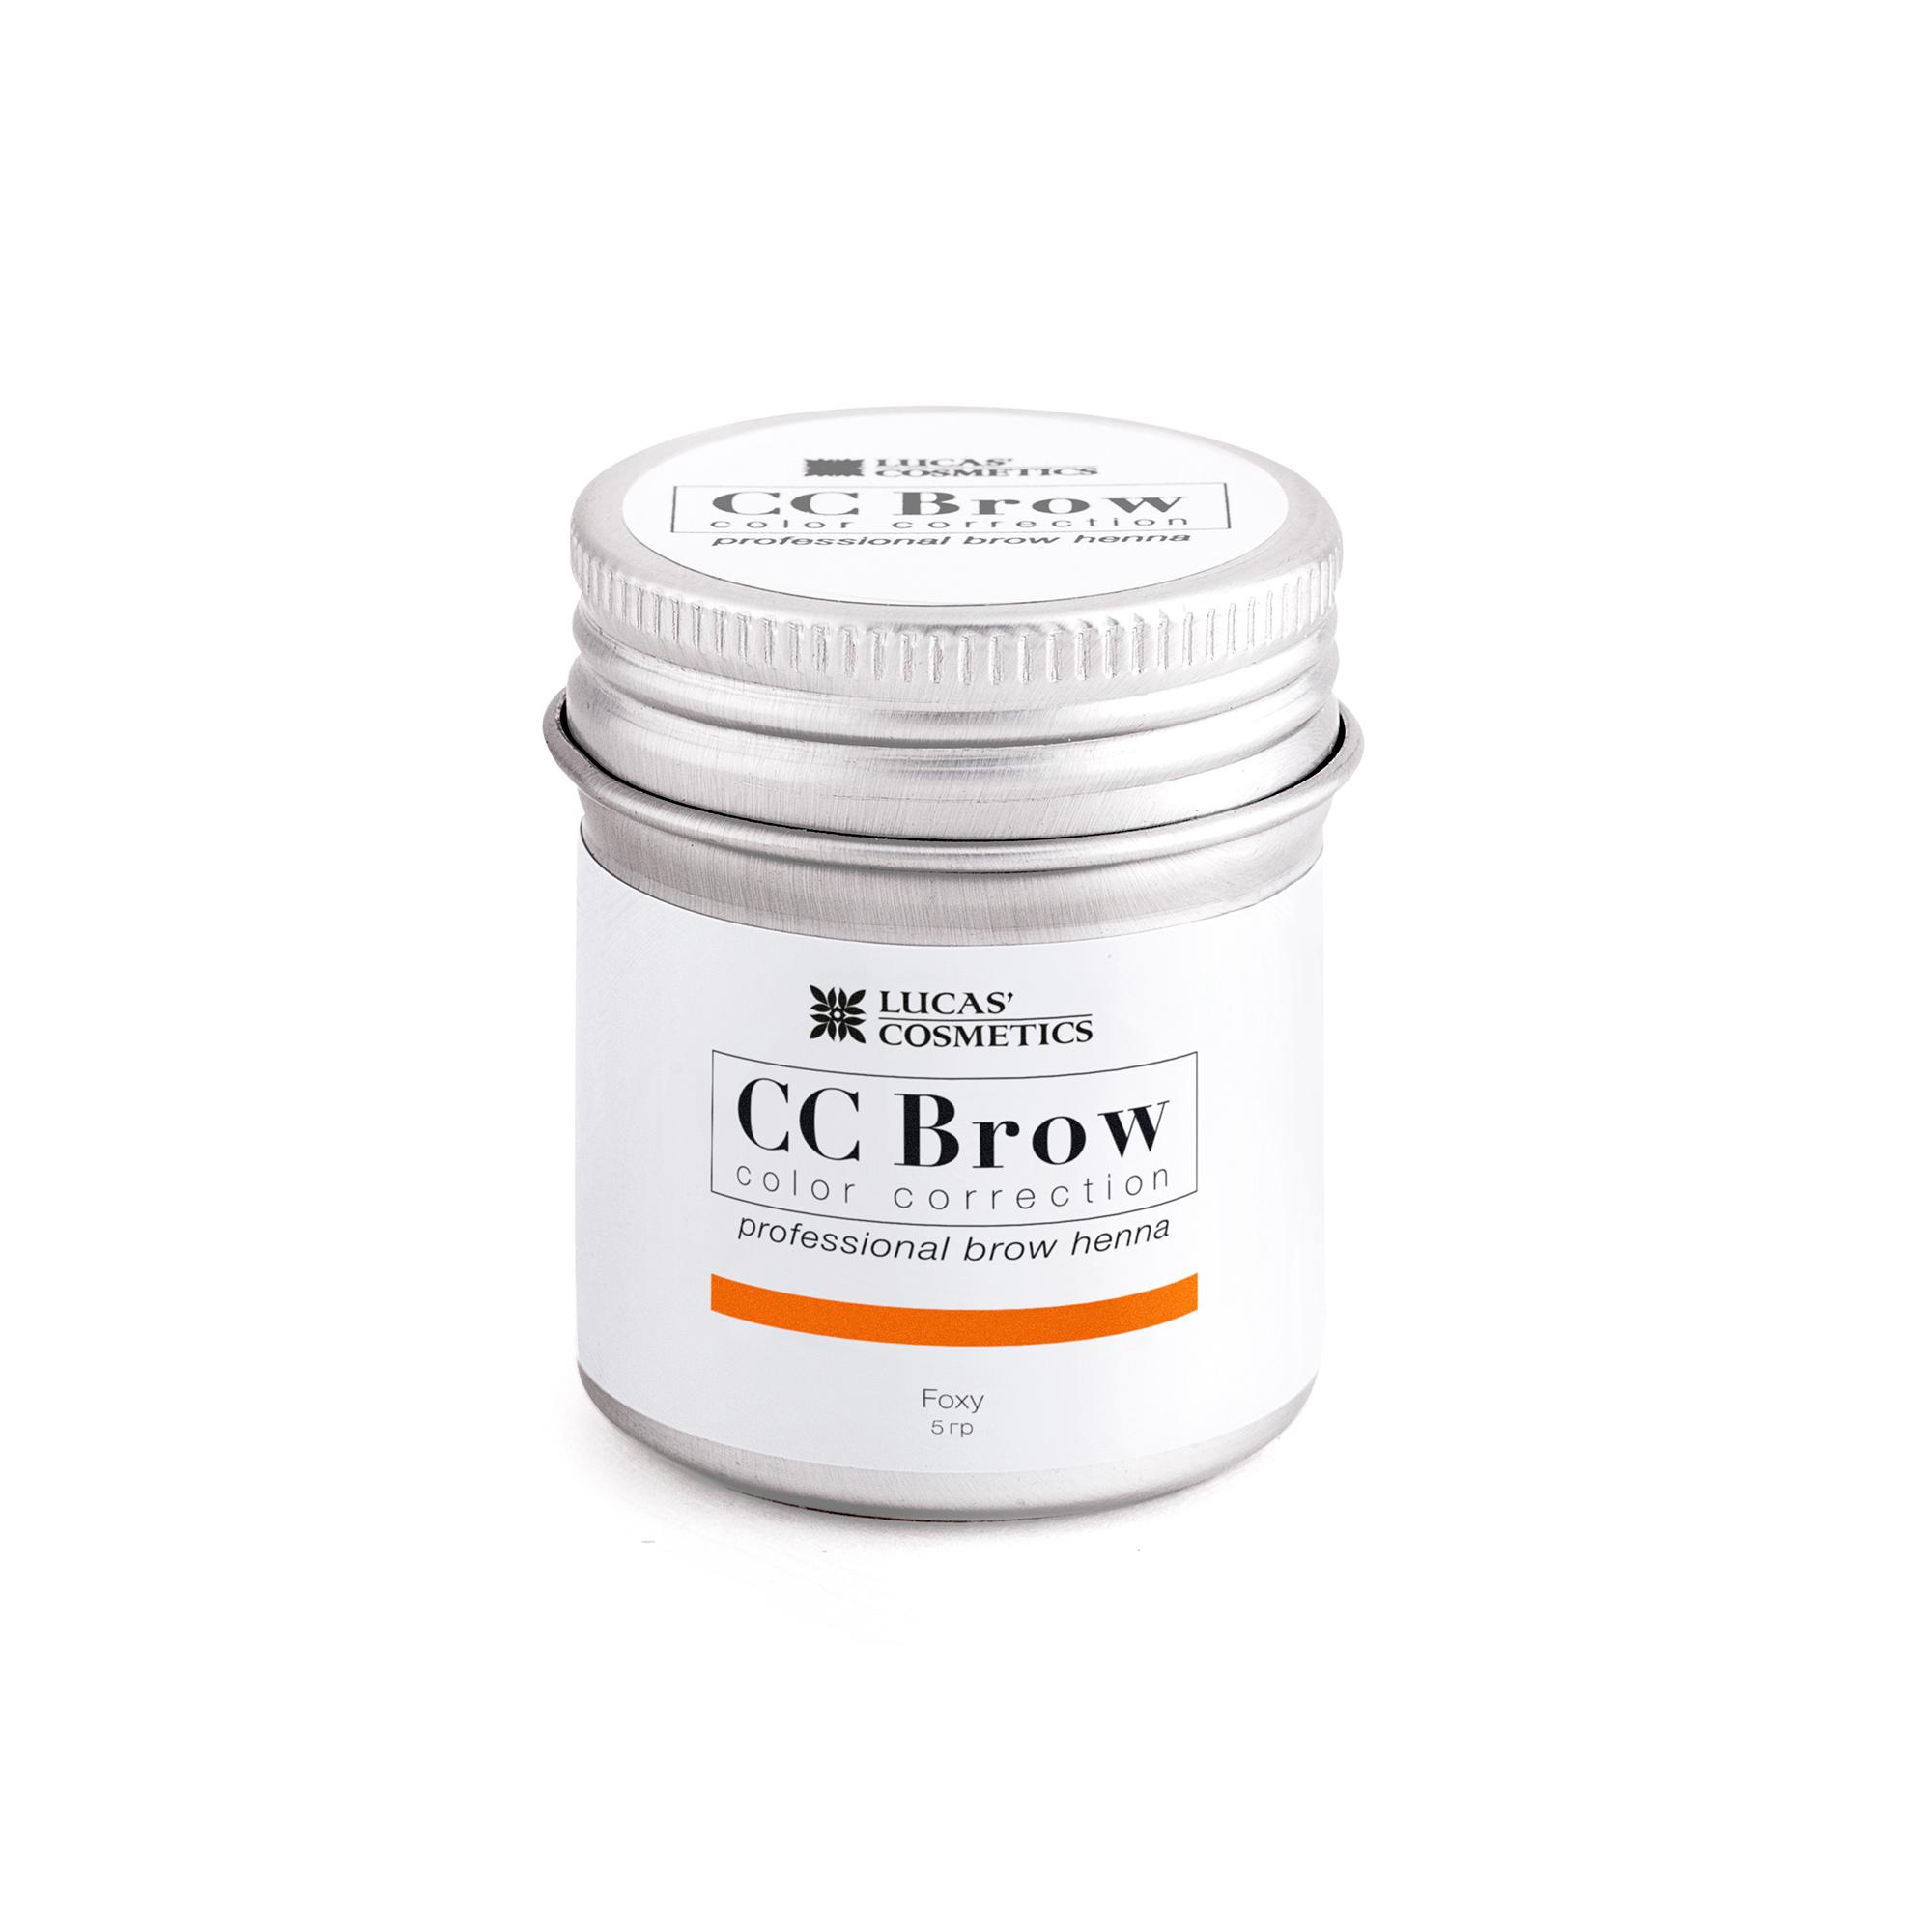 LUCAS' COSMETICS Хна для бровей в баночке (рыжий) / CC Brow (foxy), 5 гр -  Краски для бровей